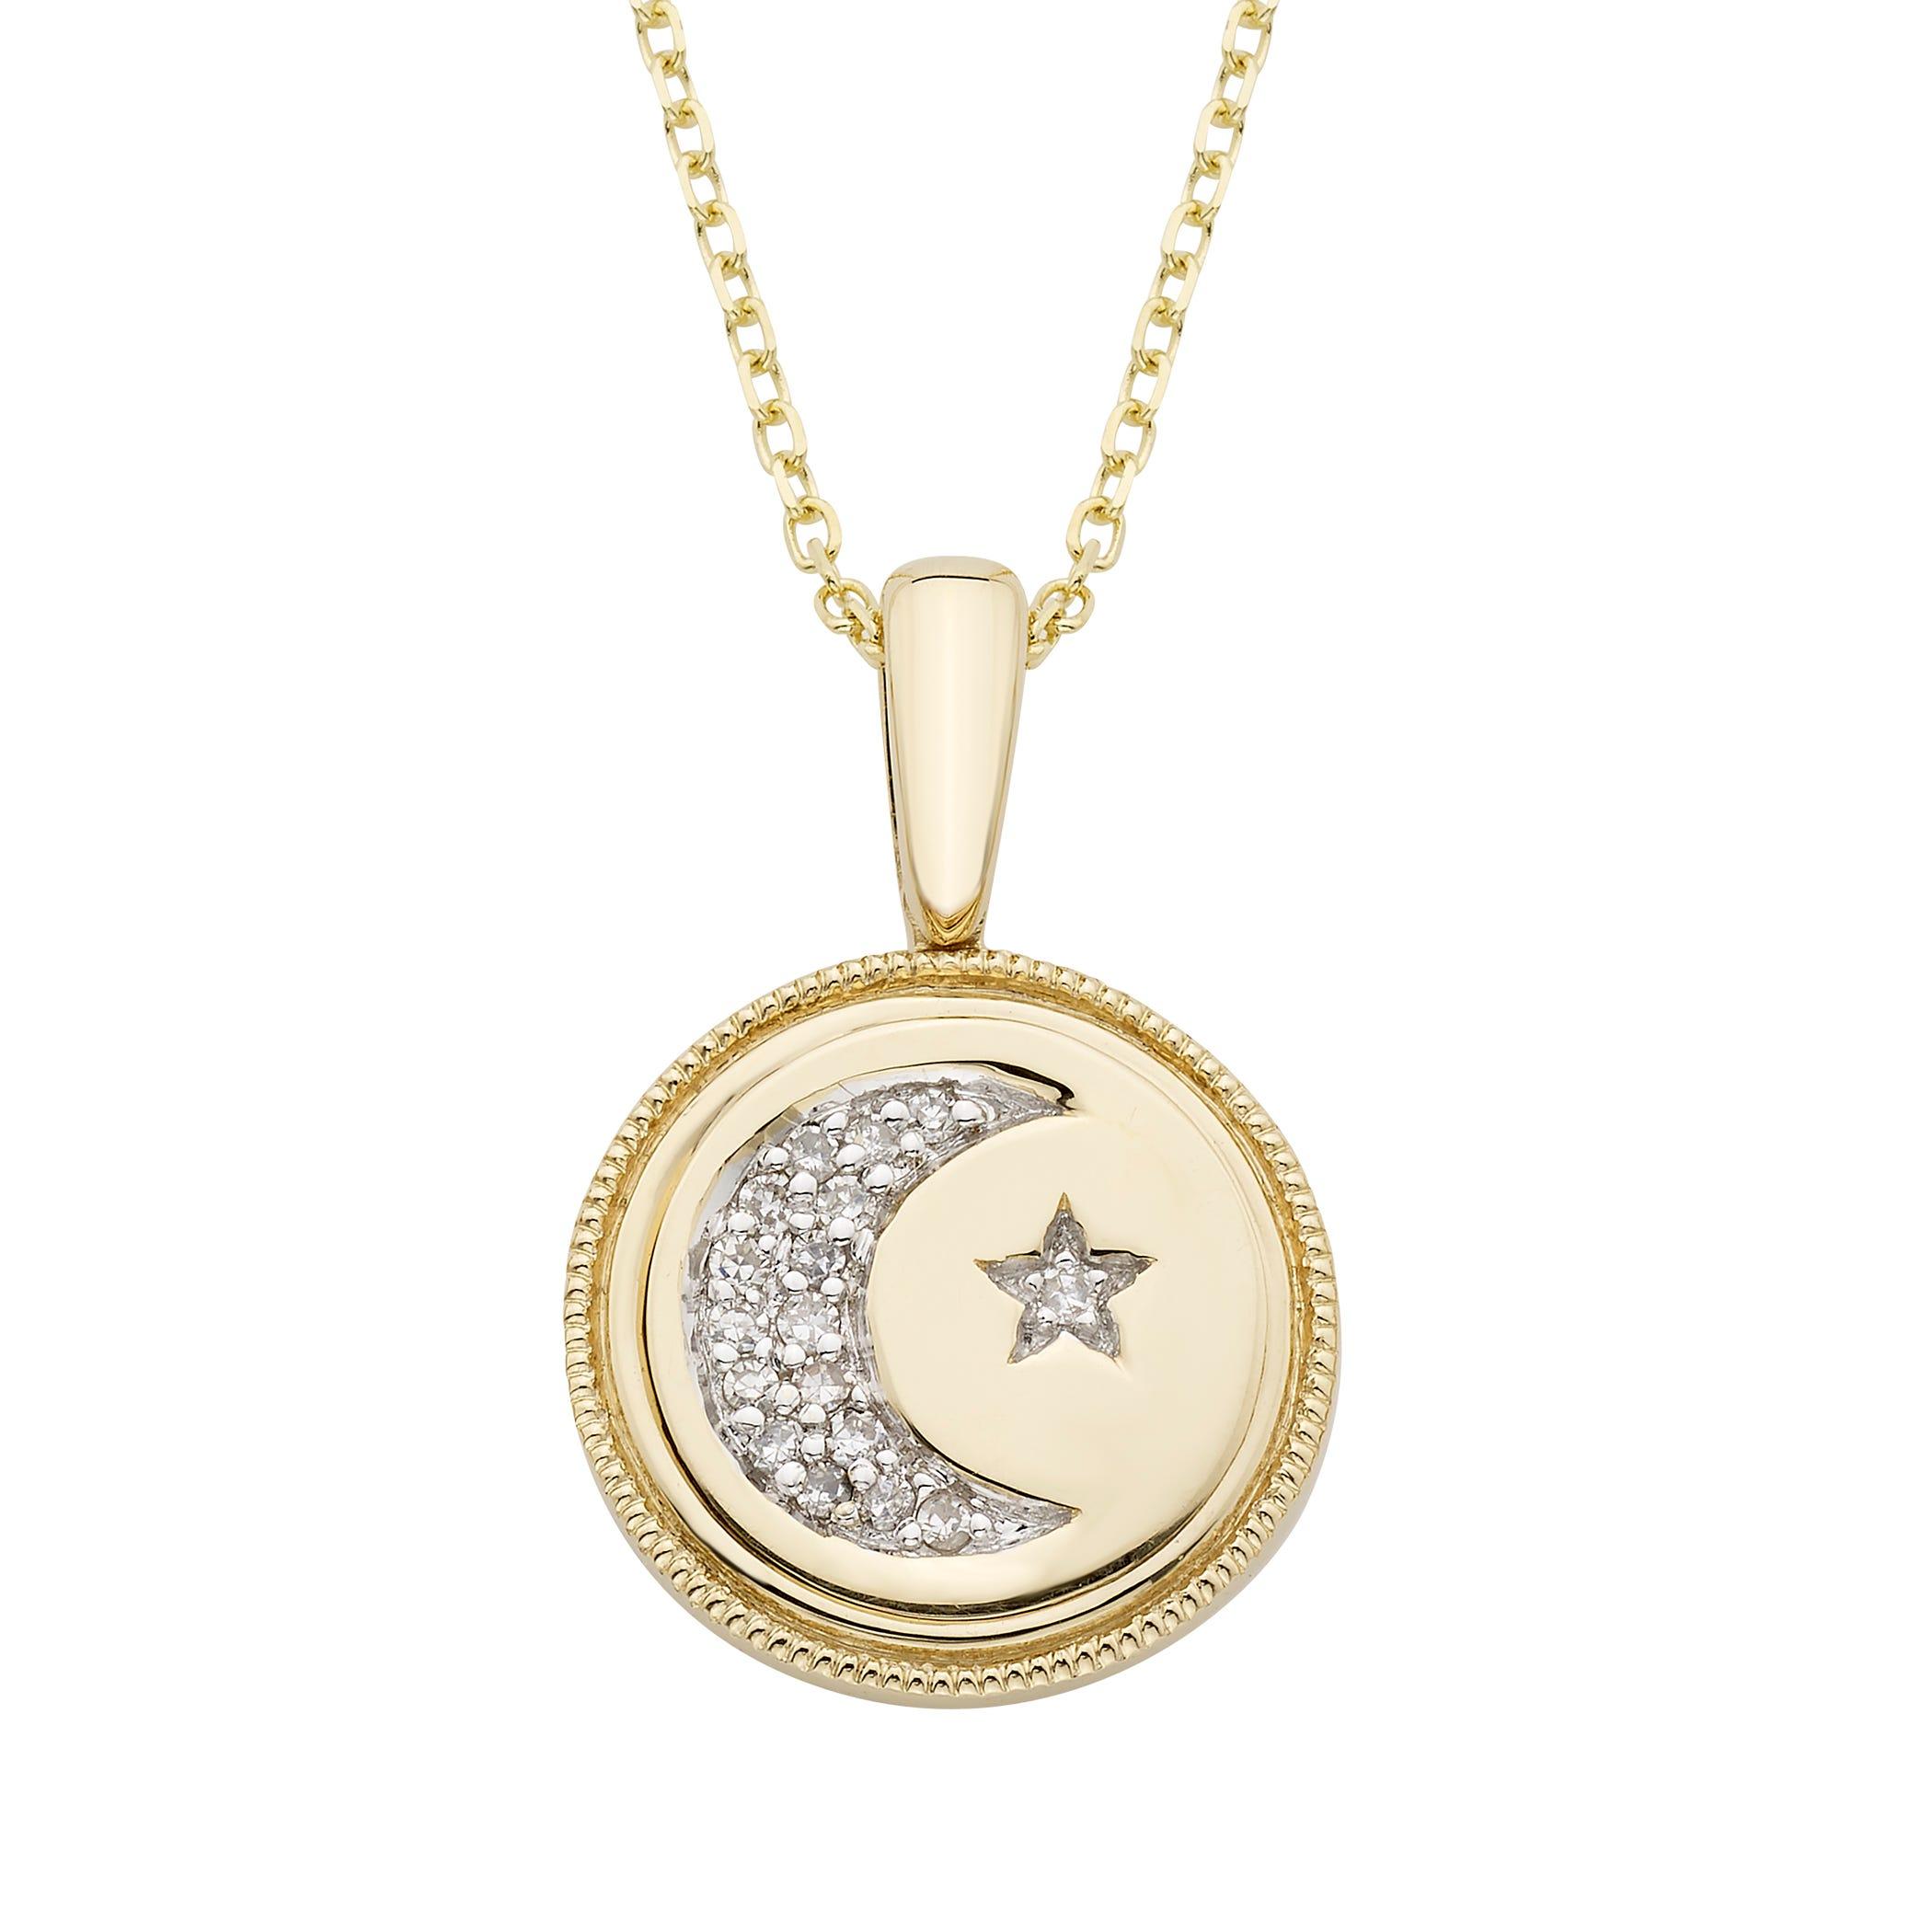 Diamond Celestial Pendant in 14k Yellow Gold